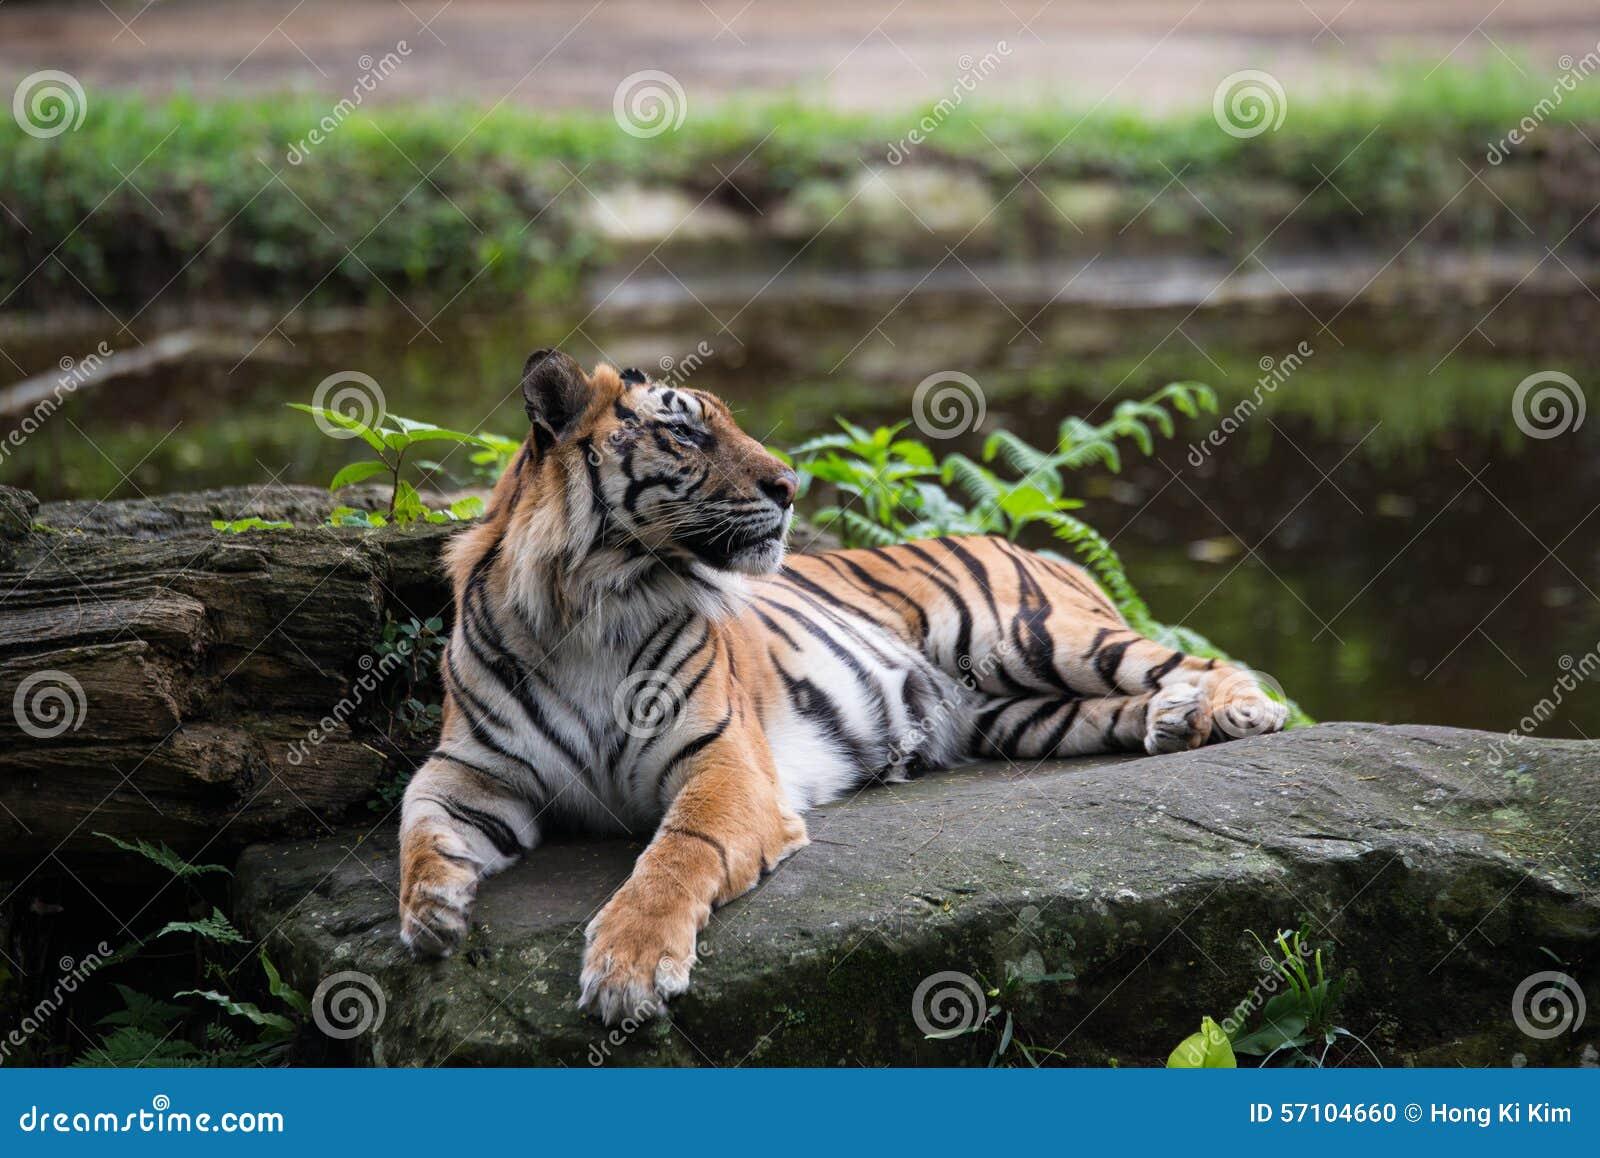 Tiger auf Felsen